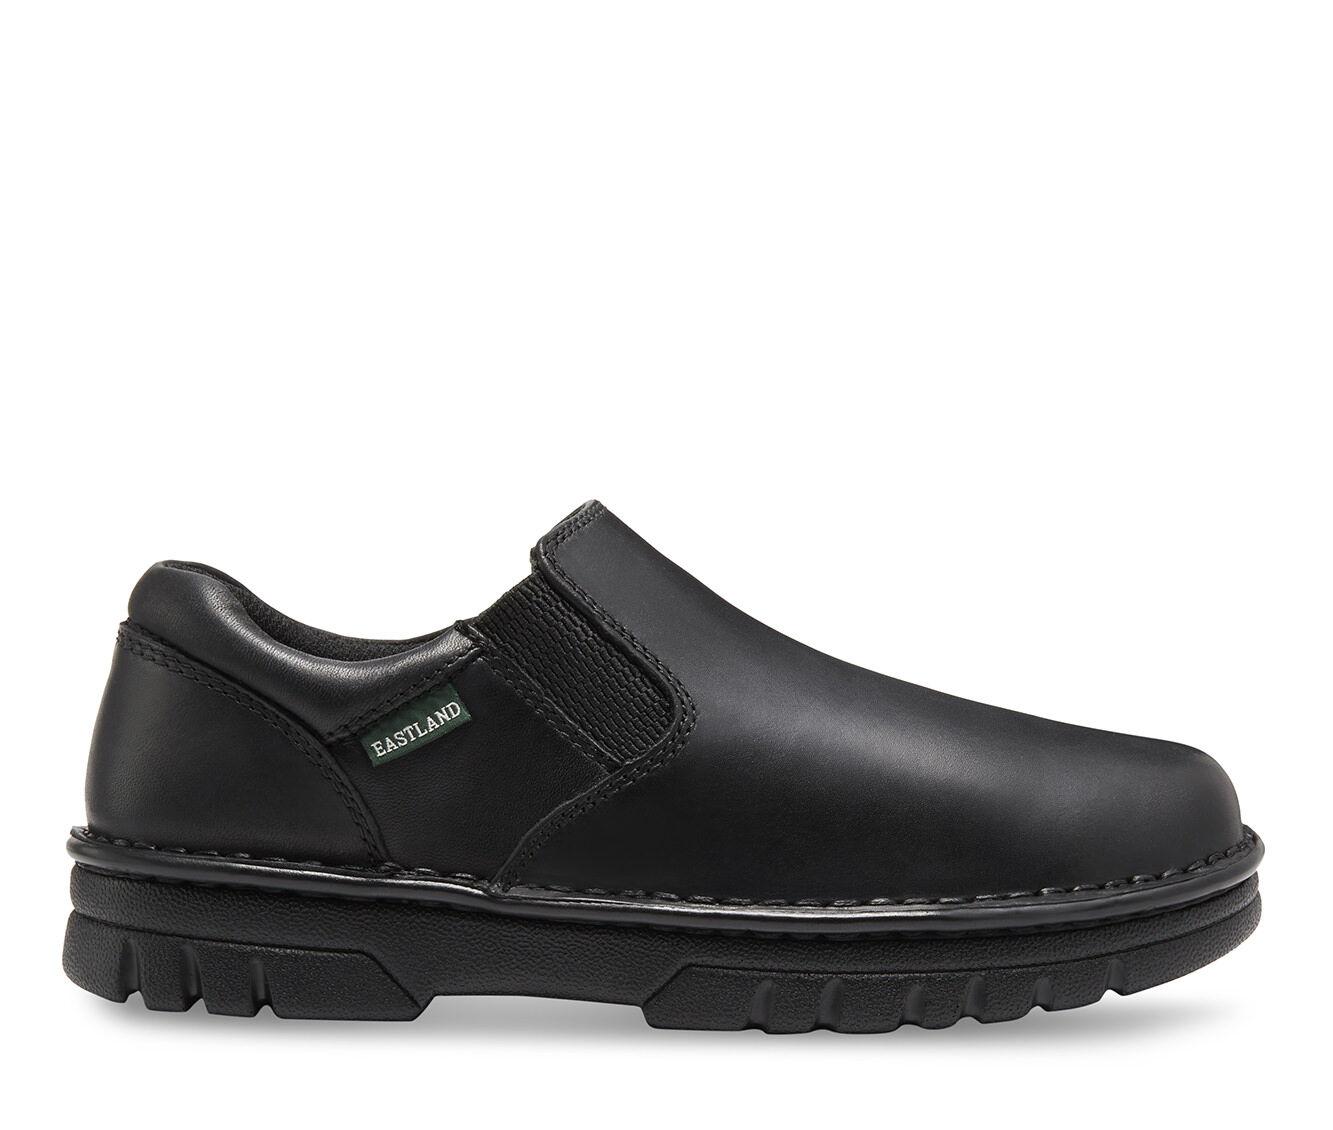 Quite Brilliant Men's Eastland Newport S/O Slip-On Shoes Black